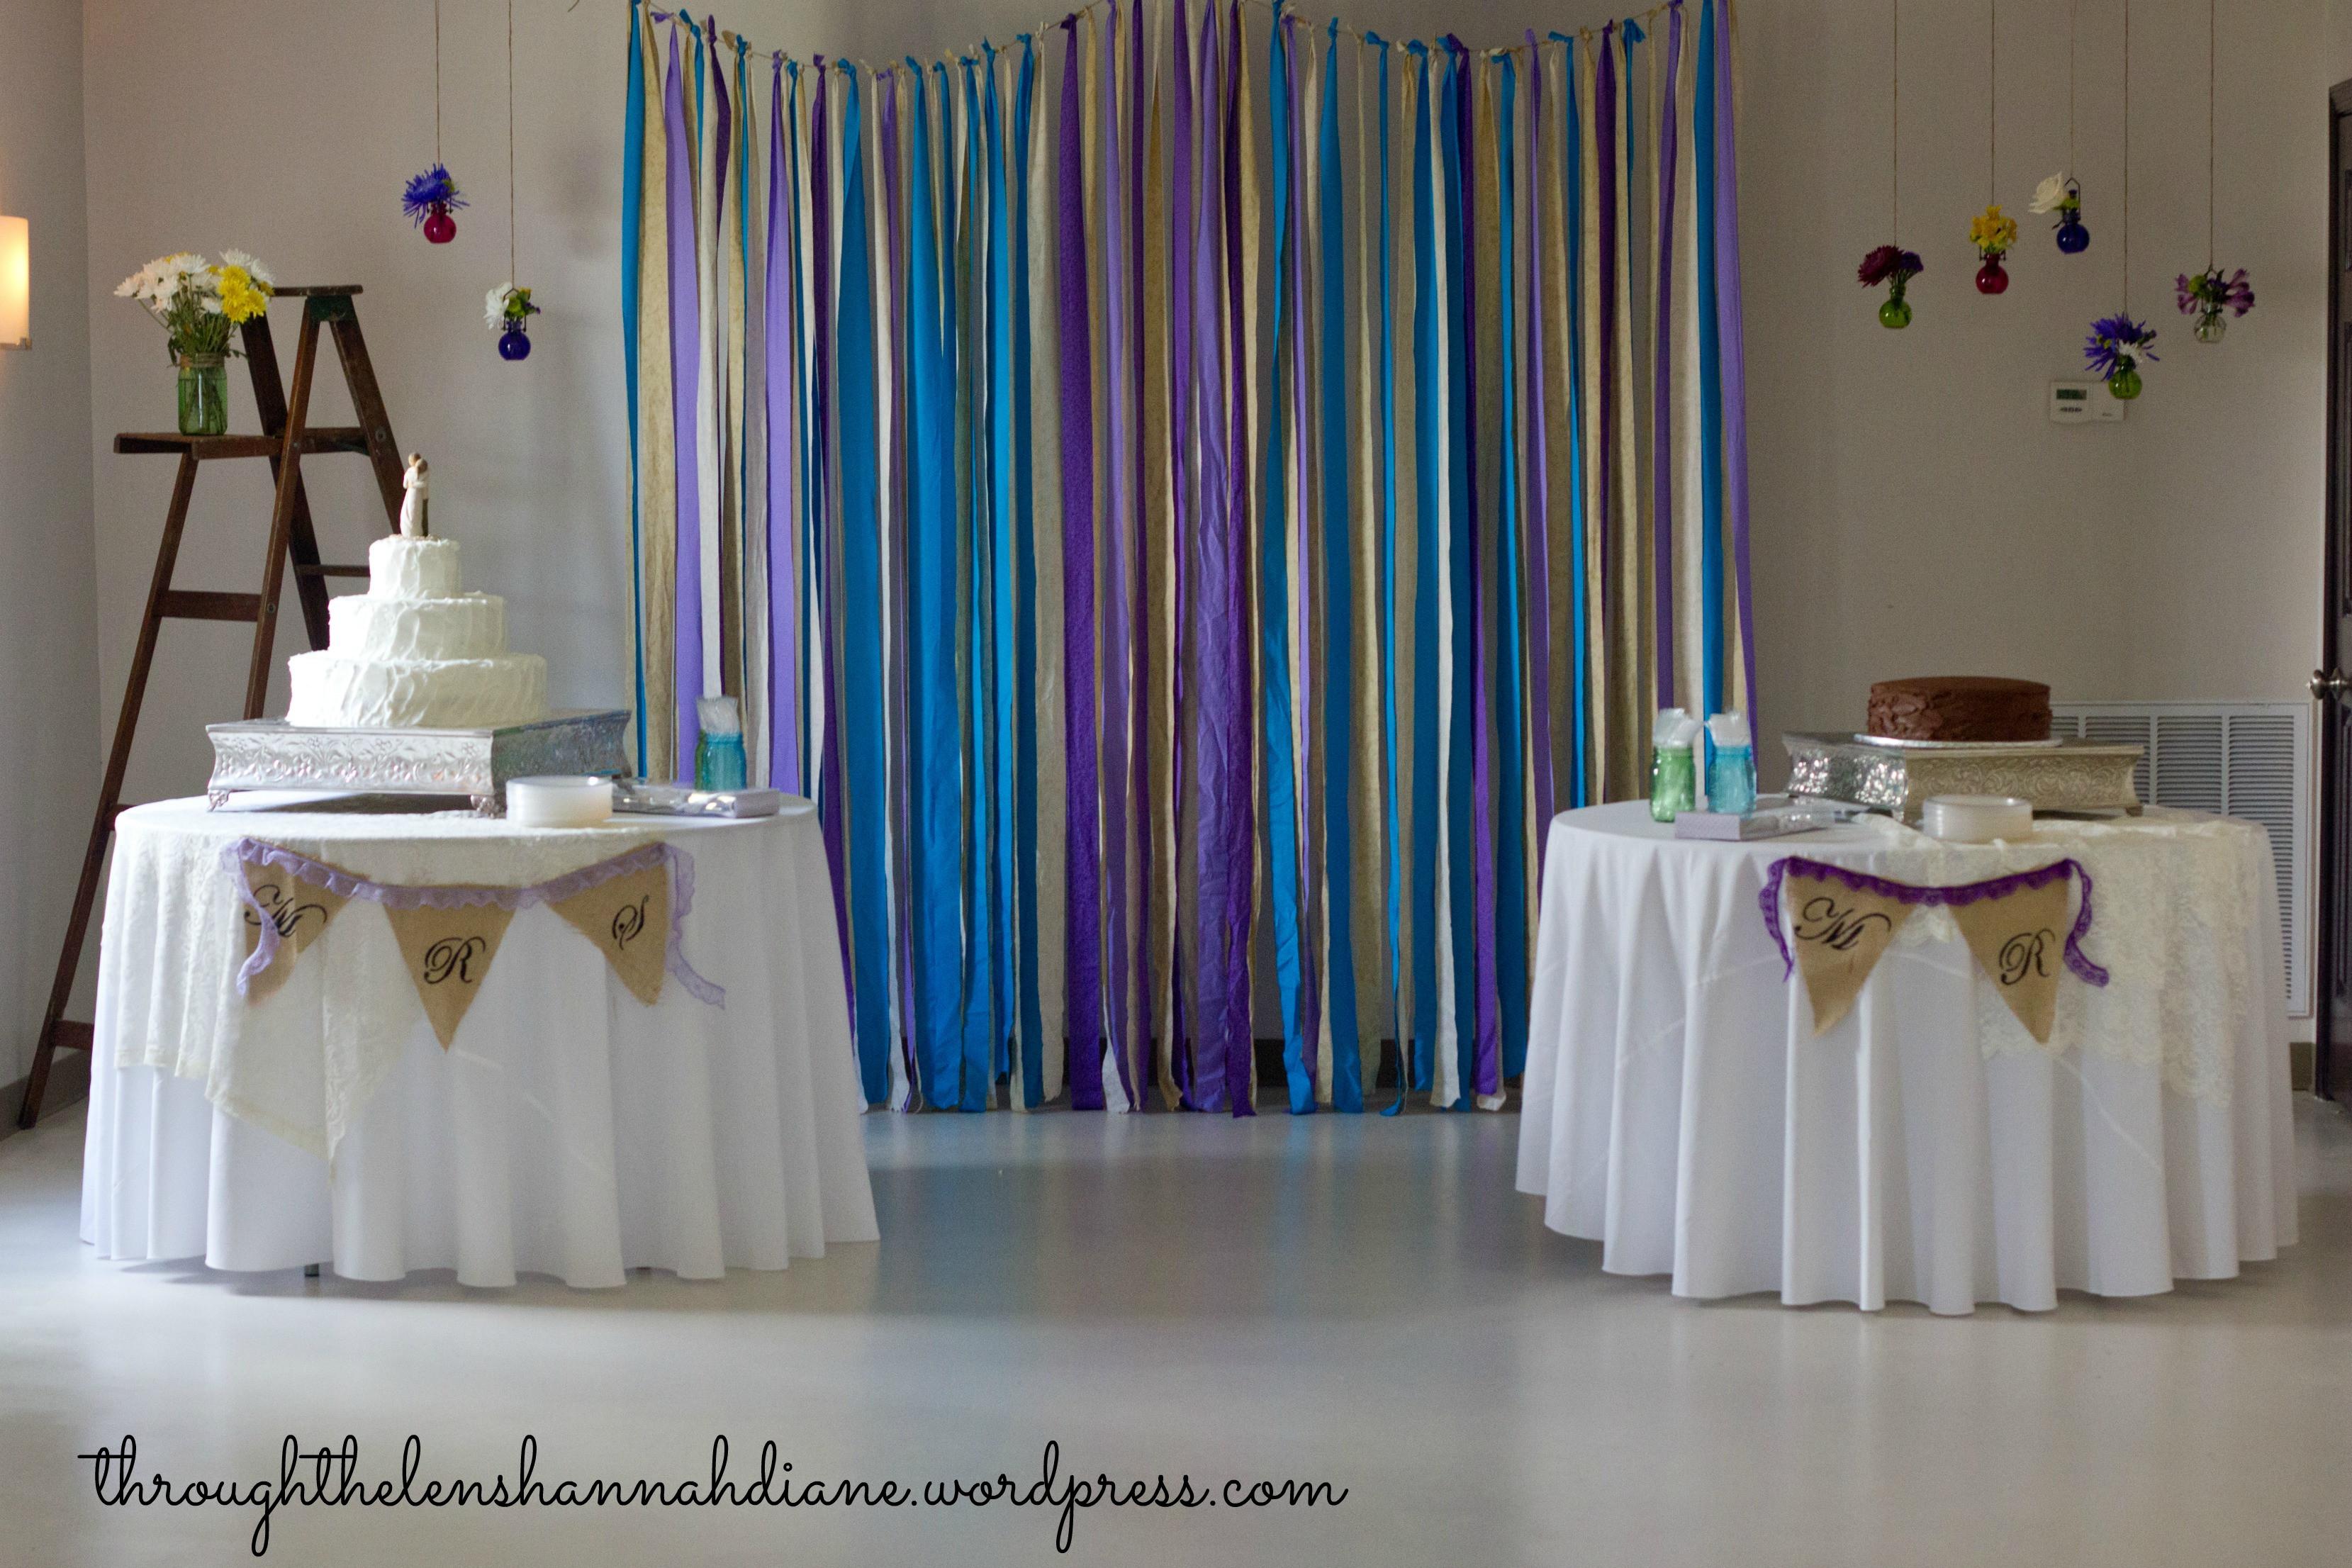 Best ideas about DIY Wedding Reception Ideas . Save or Pin My DIY Wedding Now.